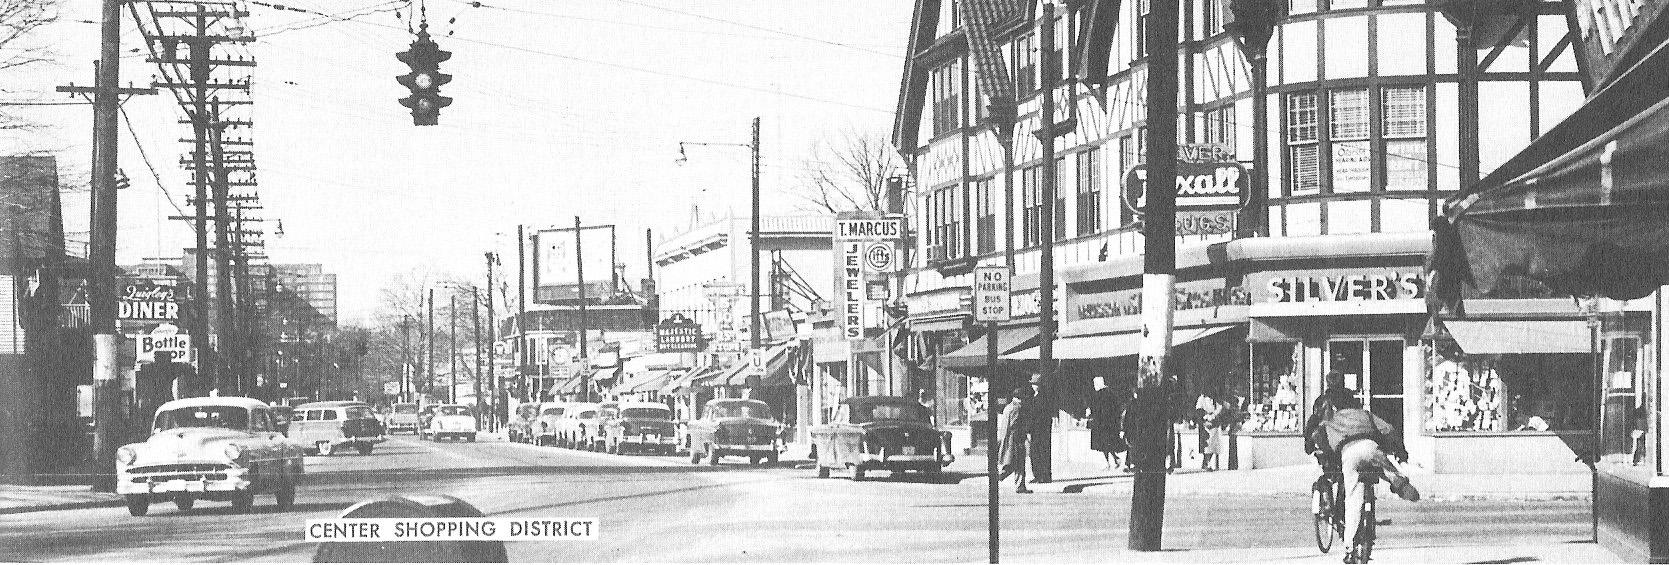 Historian's corner - Silver's Drug Shop